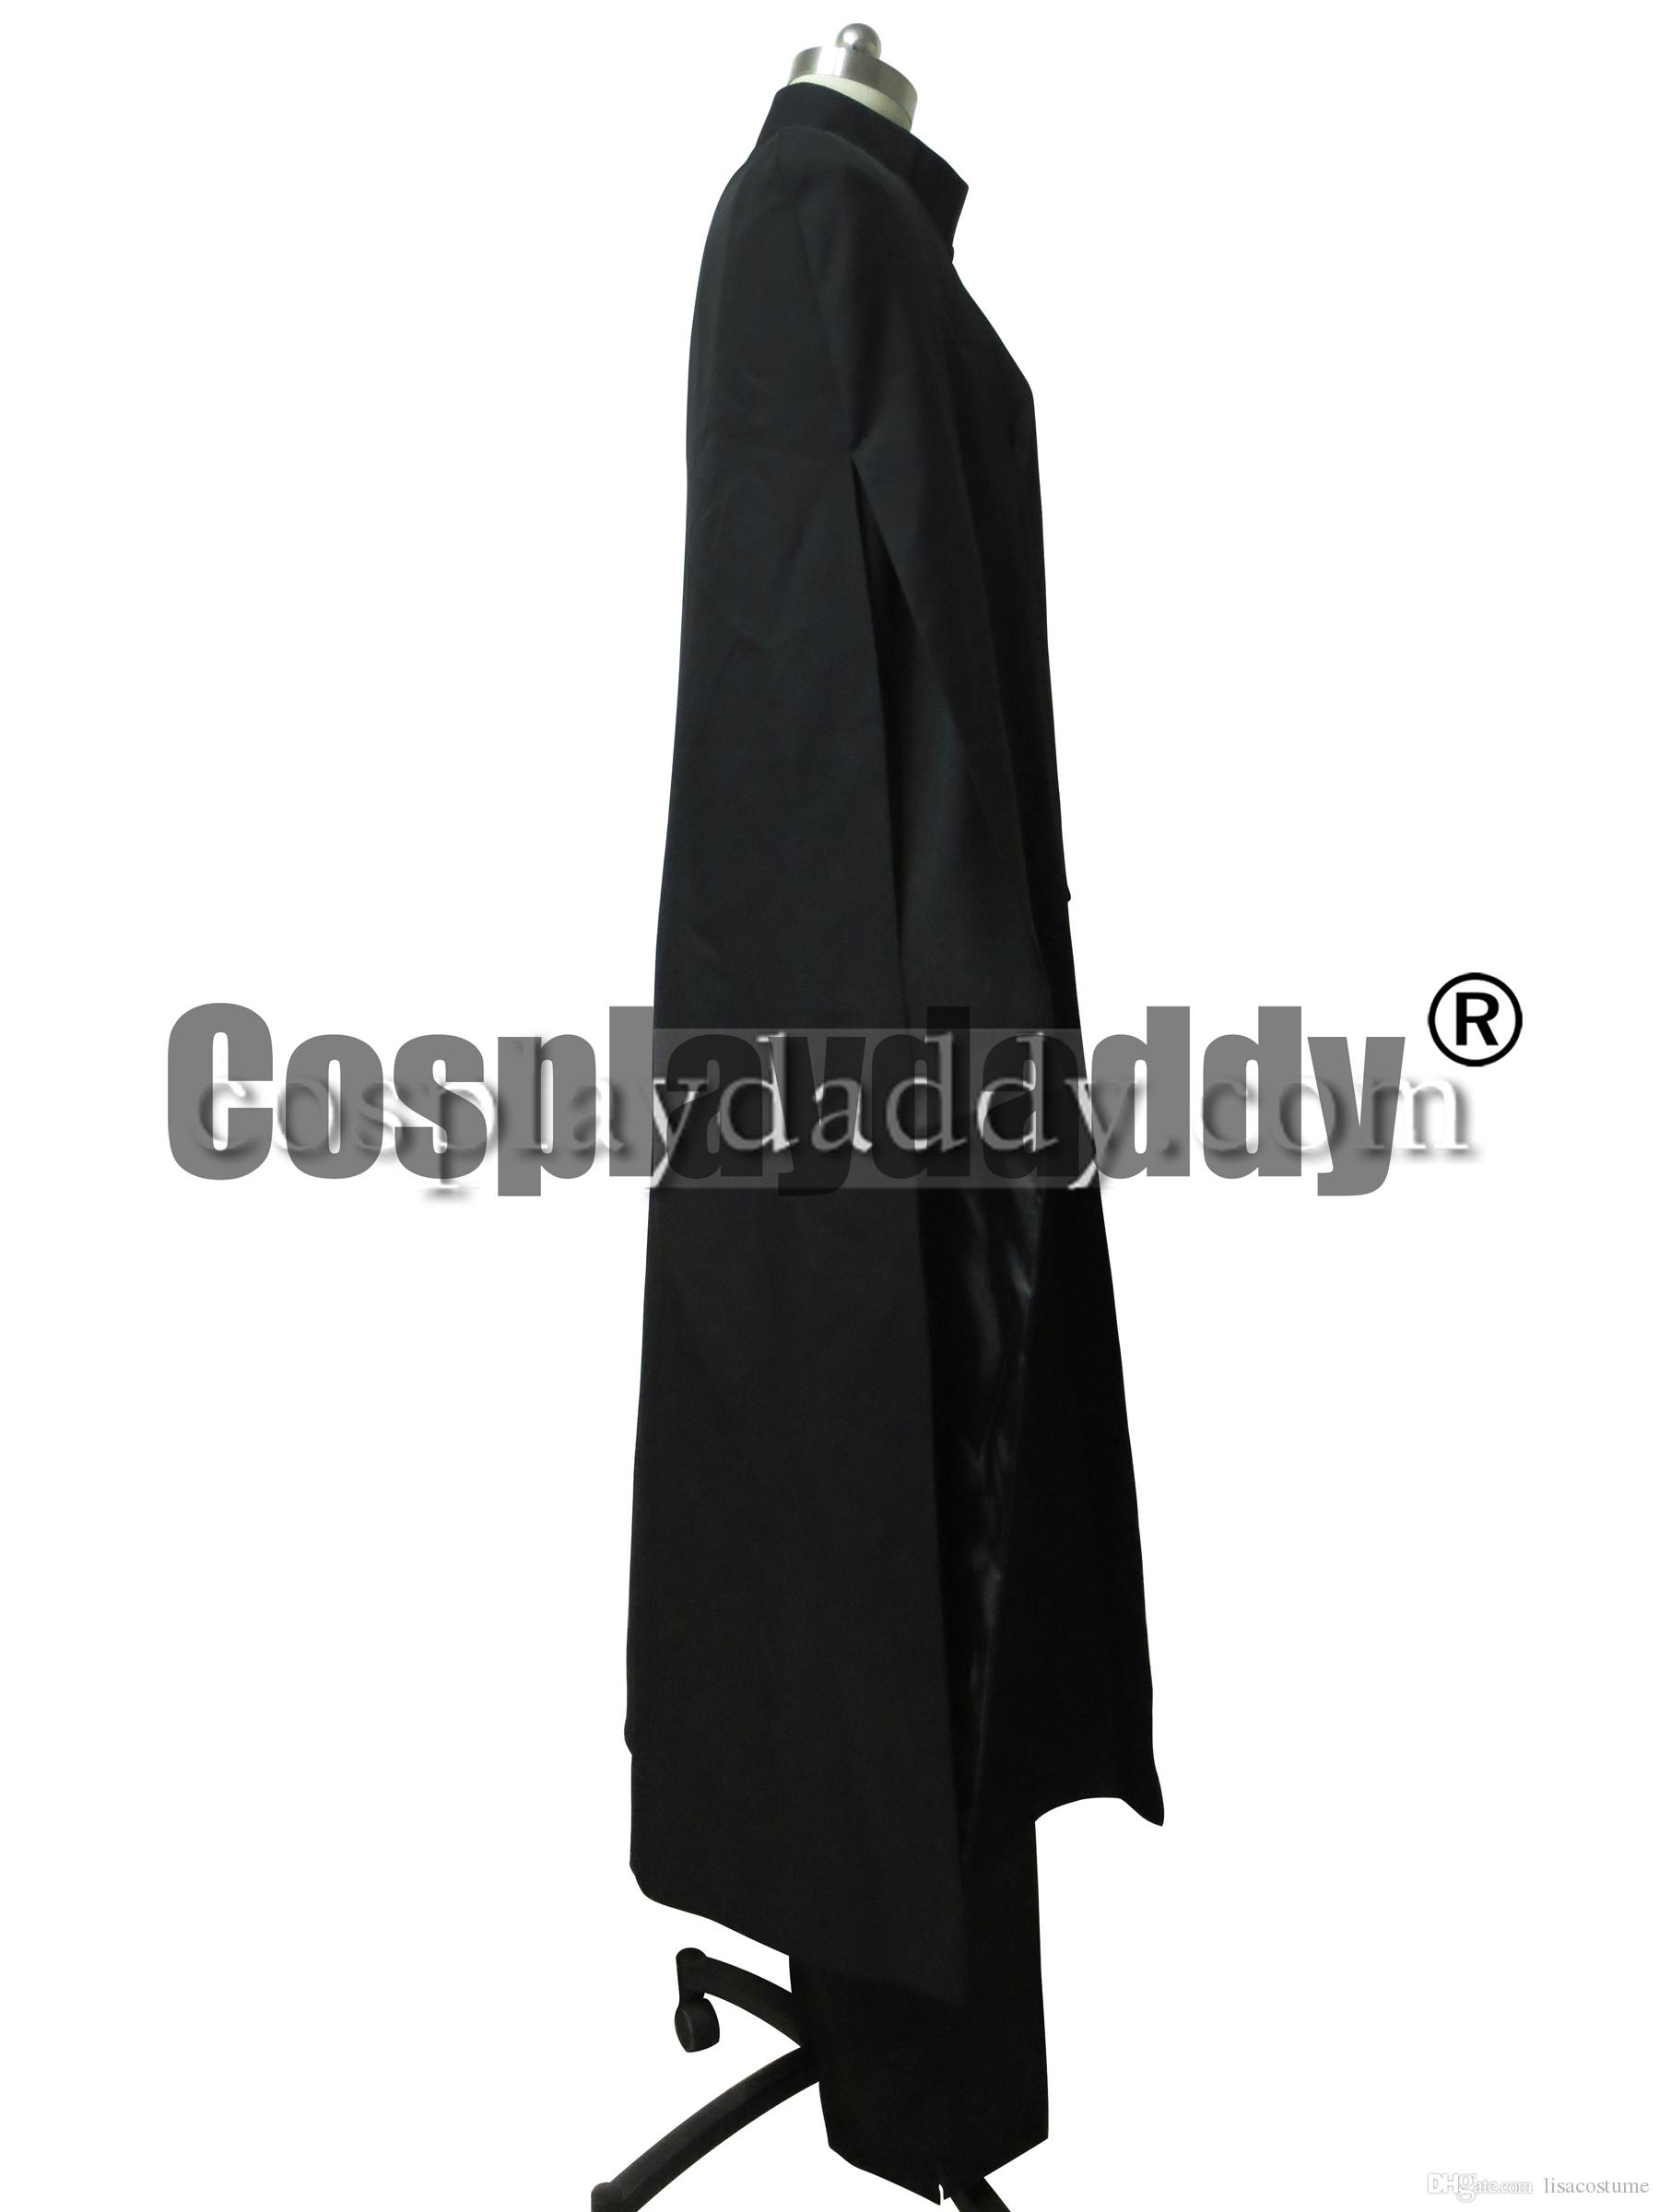 Harry Potter Reliquias de la Muerte Severus Snape Cabo Negro Disfraz de Cosplay de Halloween